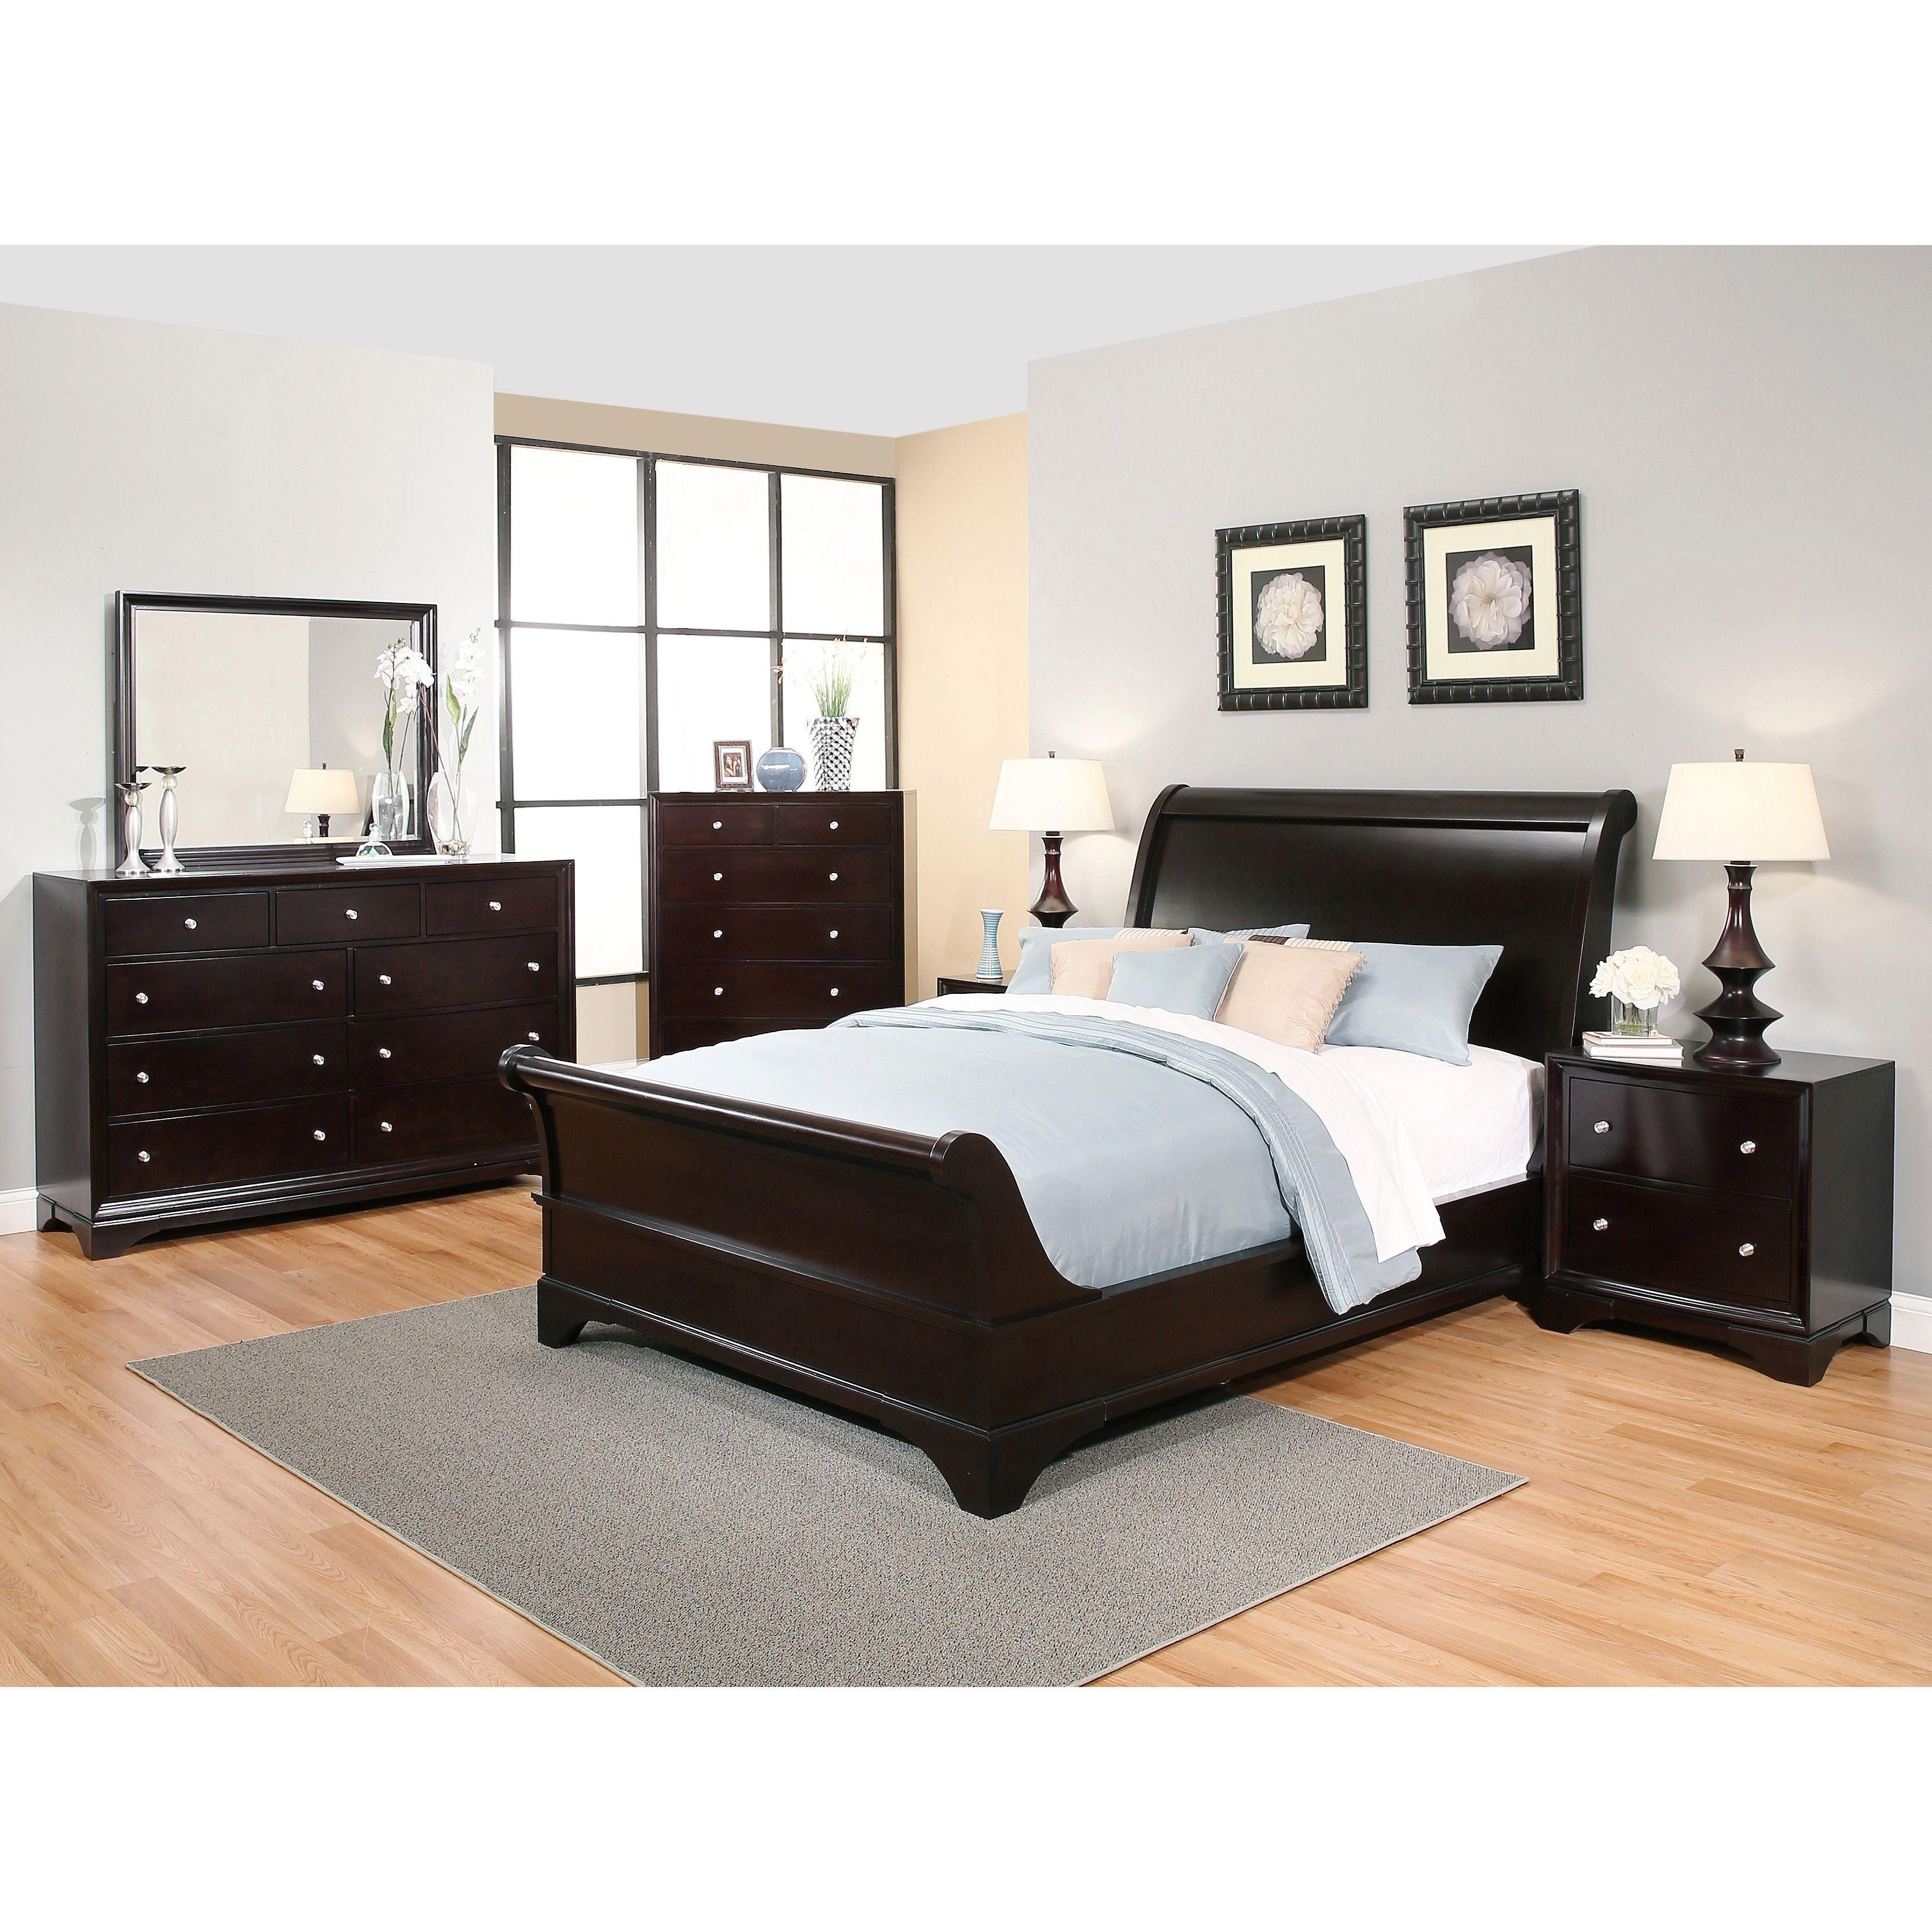 Abbyson Kingston 6-piece Espresso Sleigh Bedroom Set (